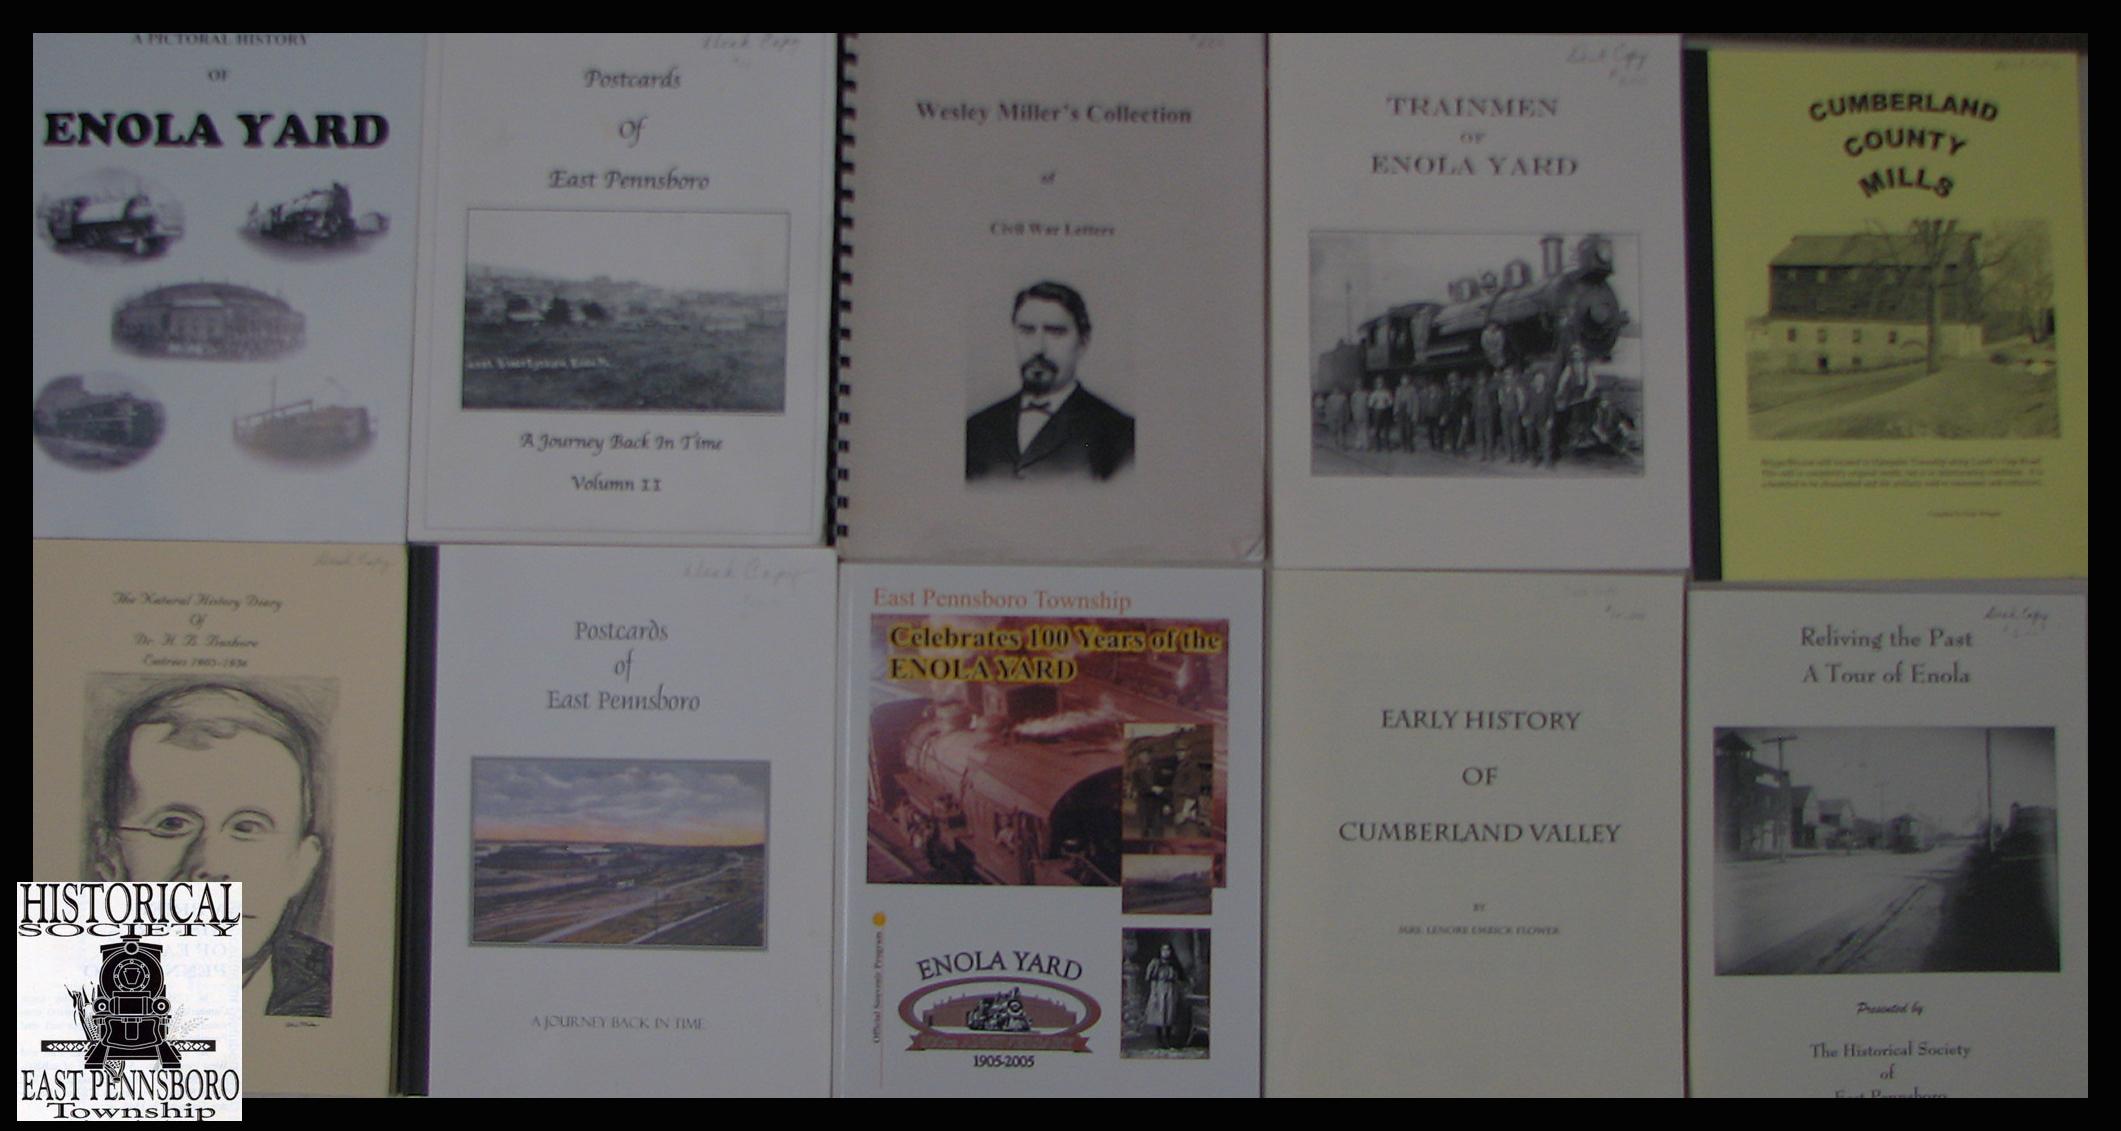 HSEP PUBLICATIONS COPY